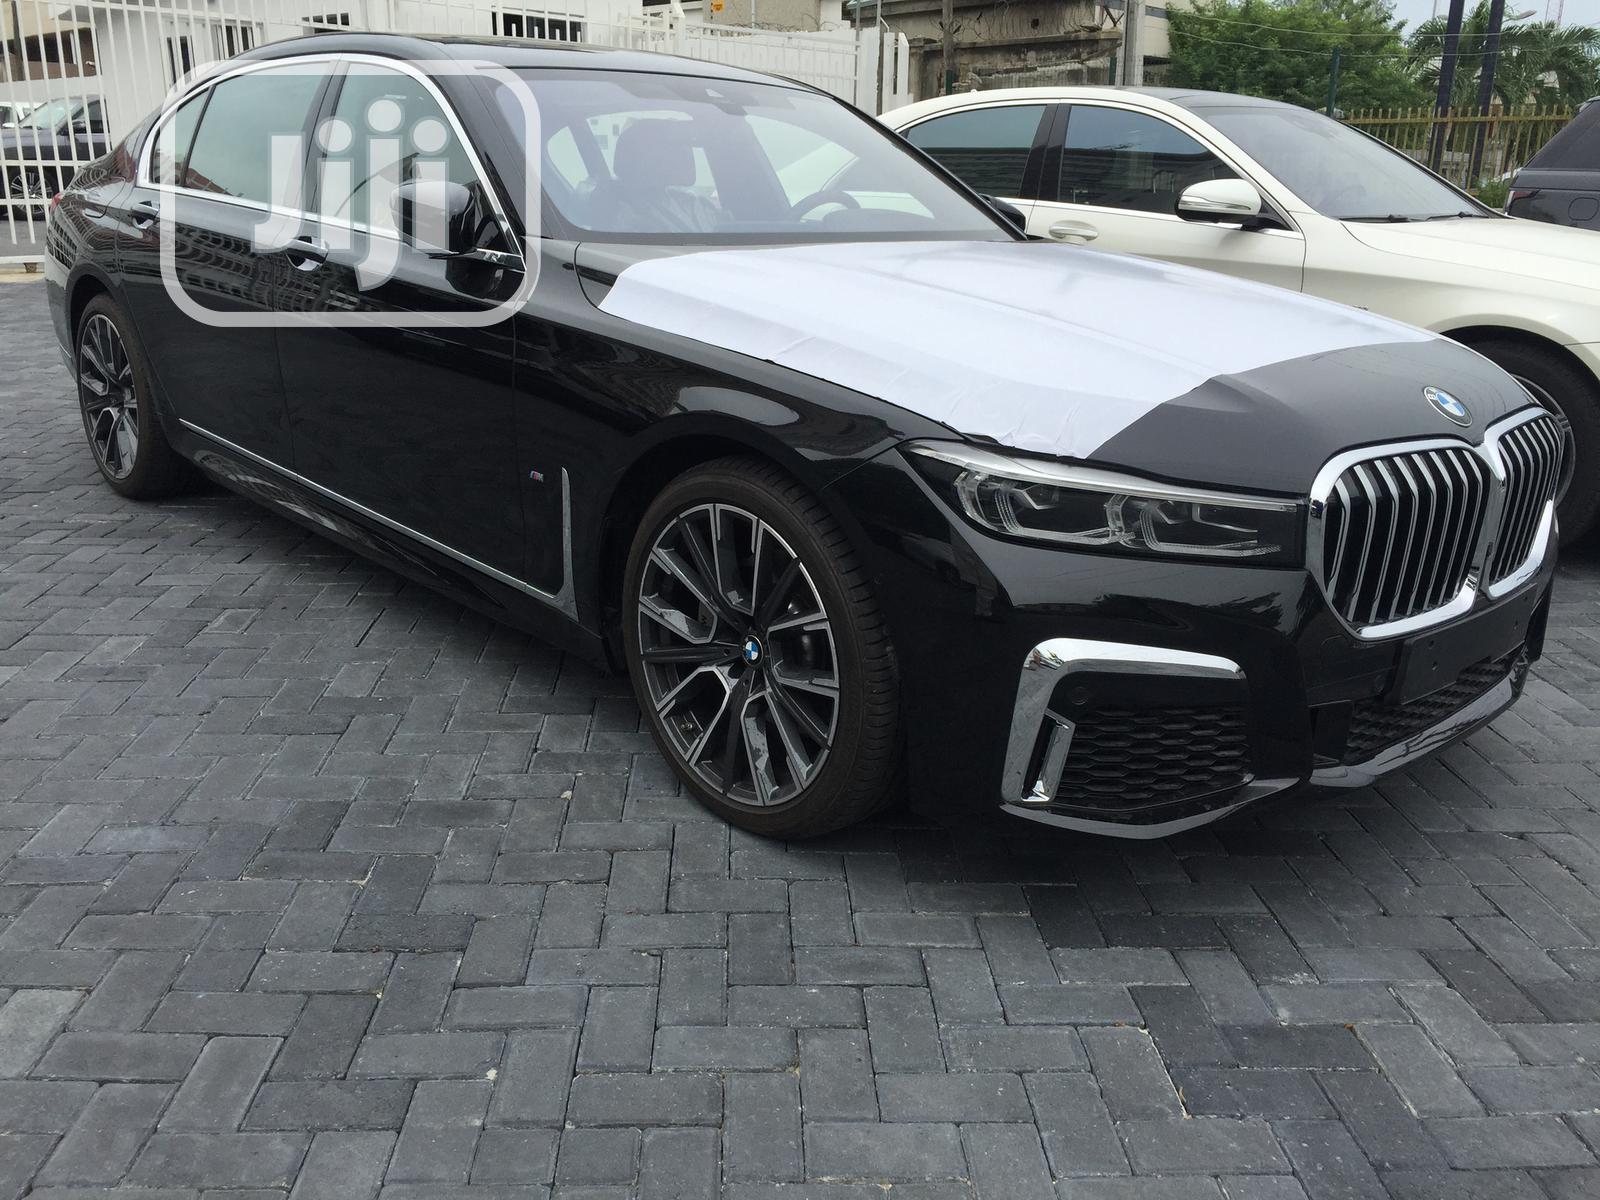 New Bmw 7 Series 2020 Black In Victoria Island Cars Lanshi Global Limited Jiji Ng